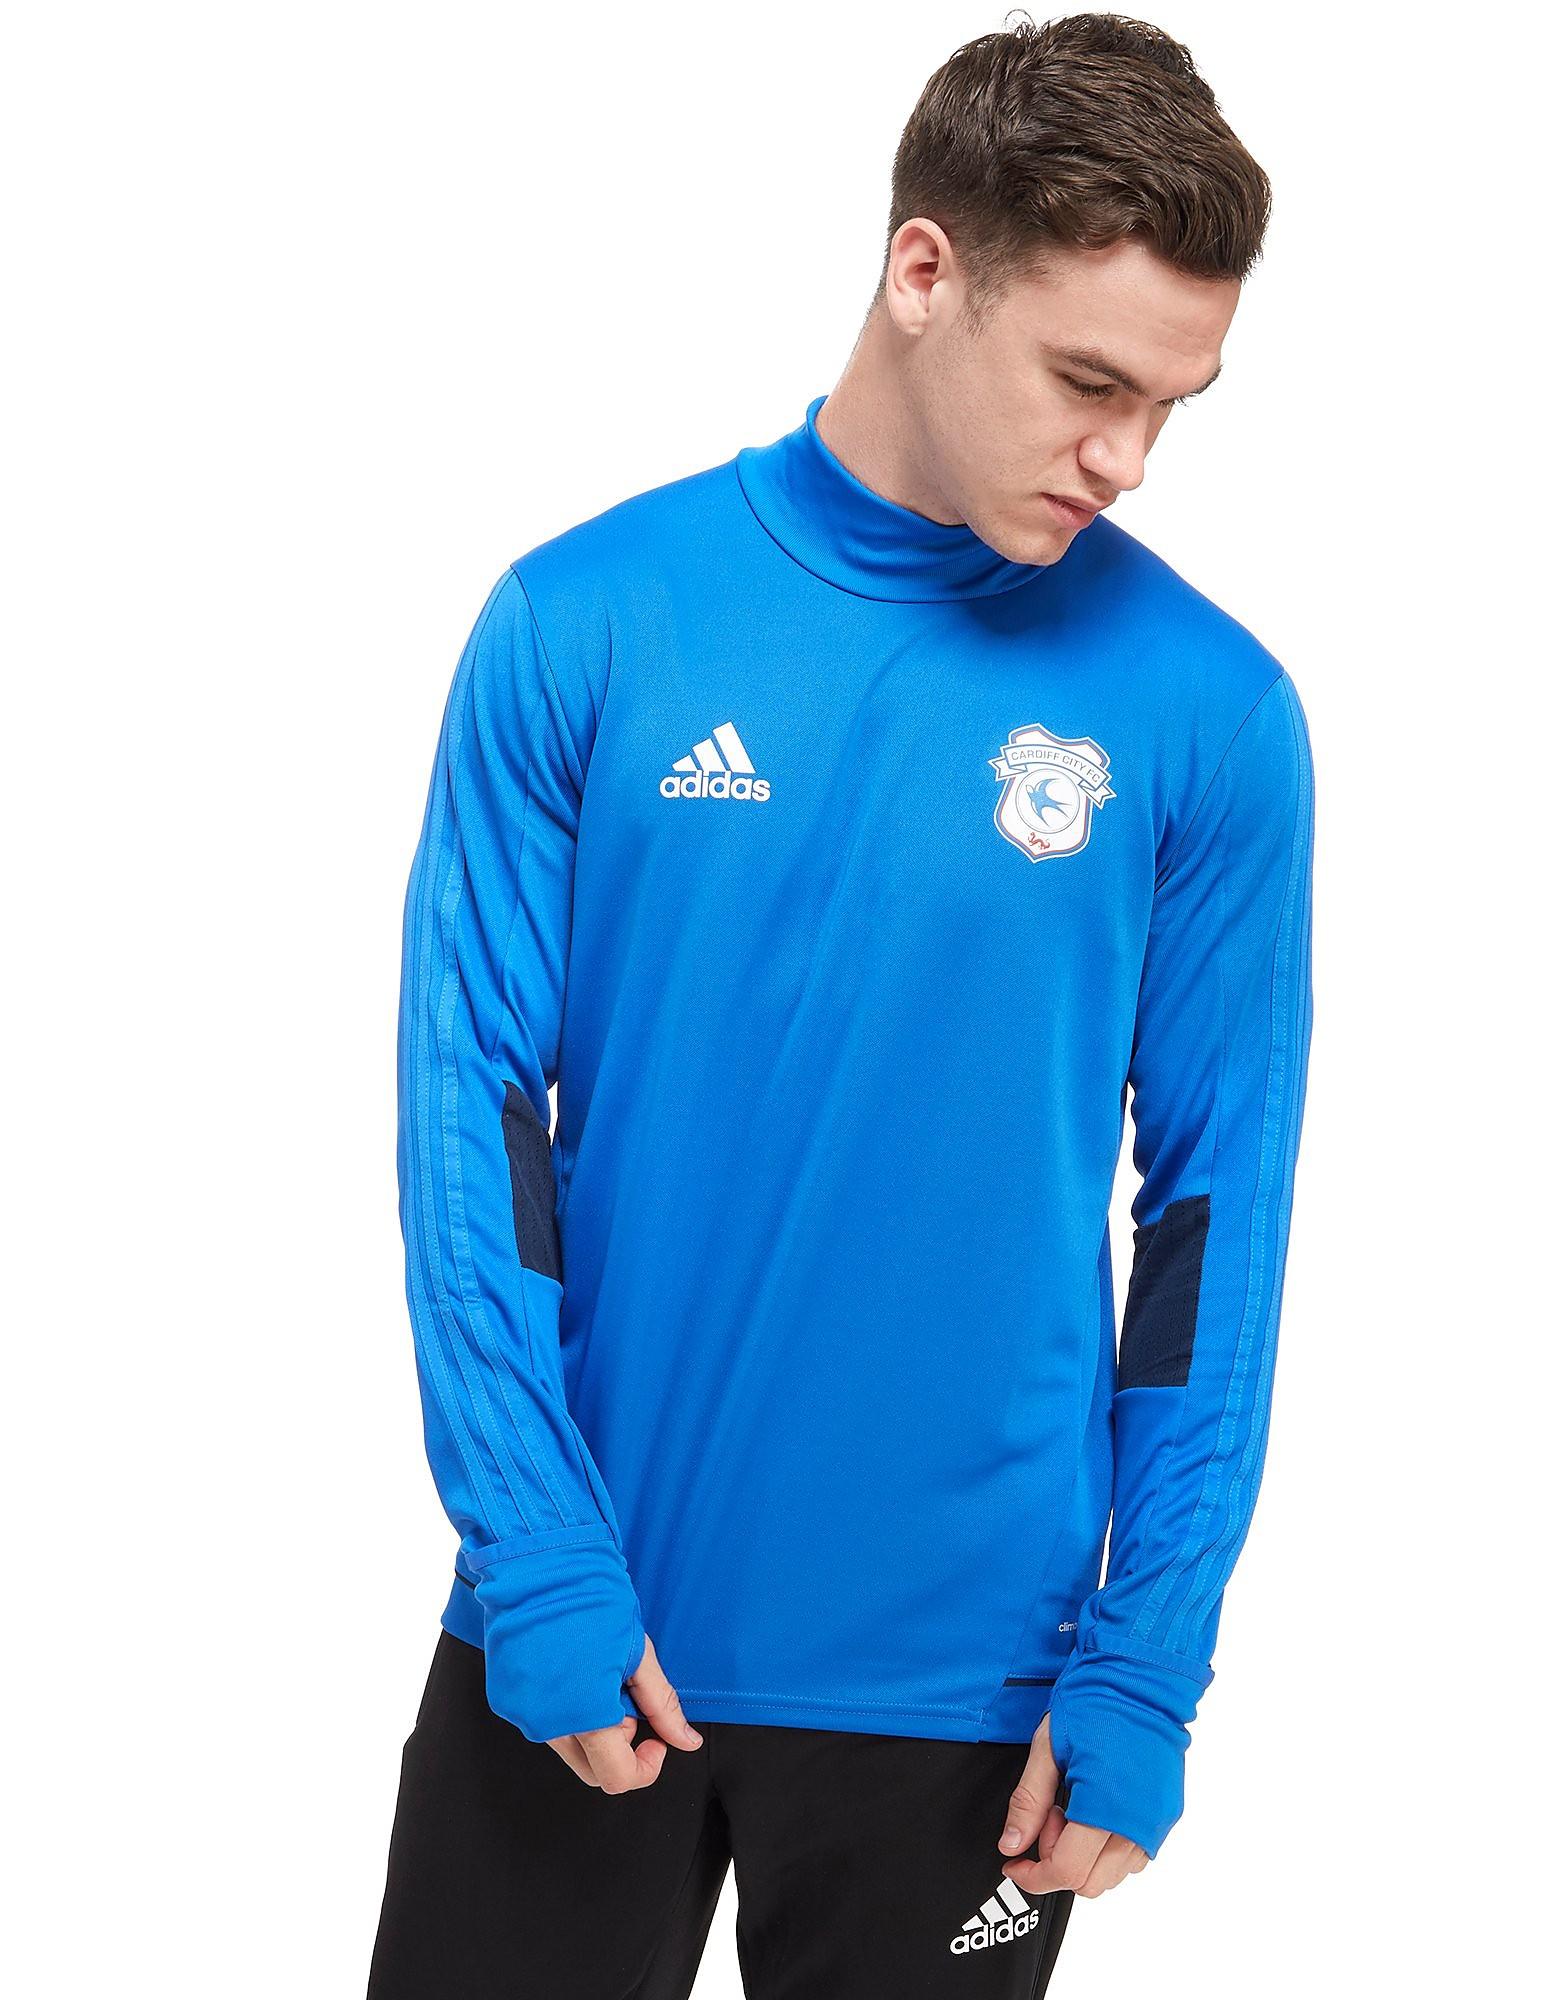 adidas Cardiff City FC 2017 Training Top